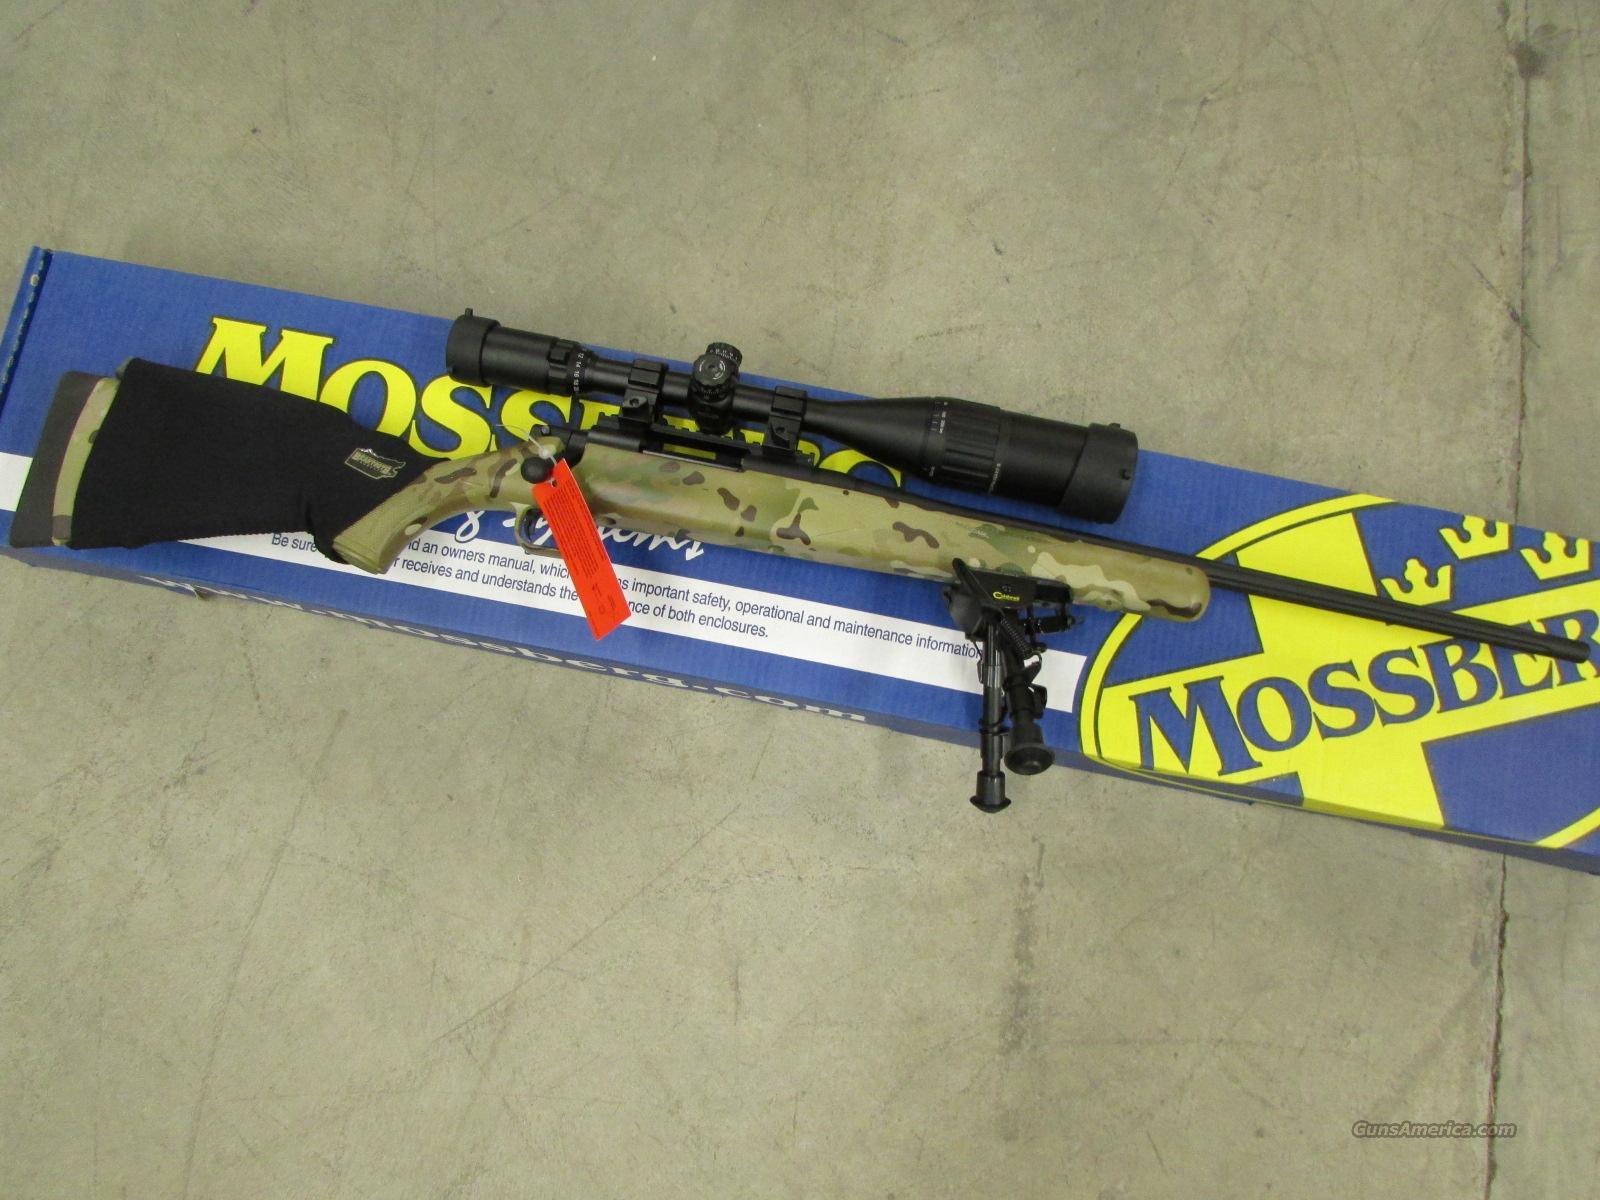 Mossberg Atr Night Train Iv Rifle Multicam With Scope